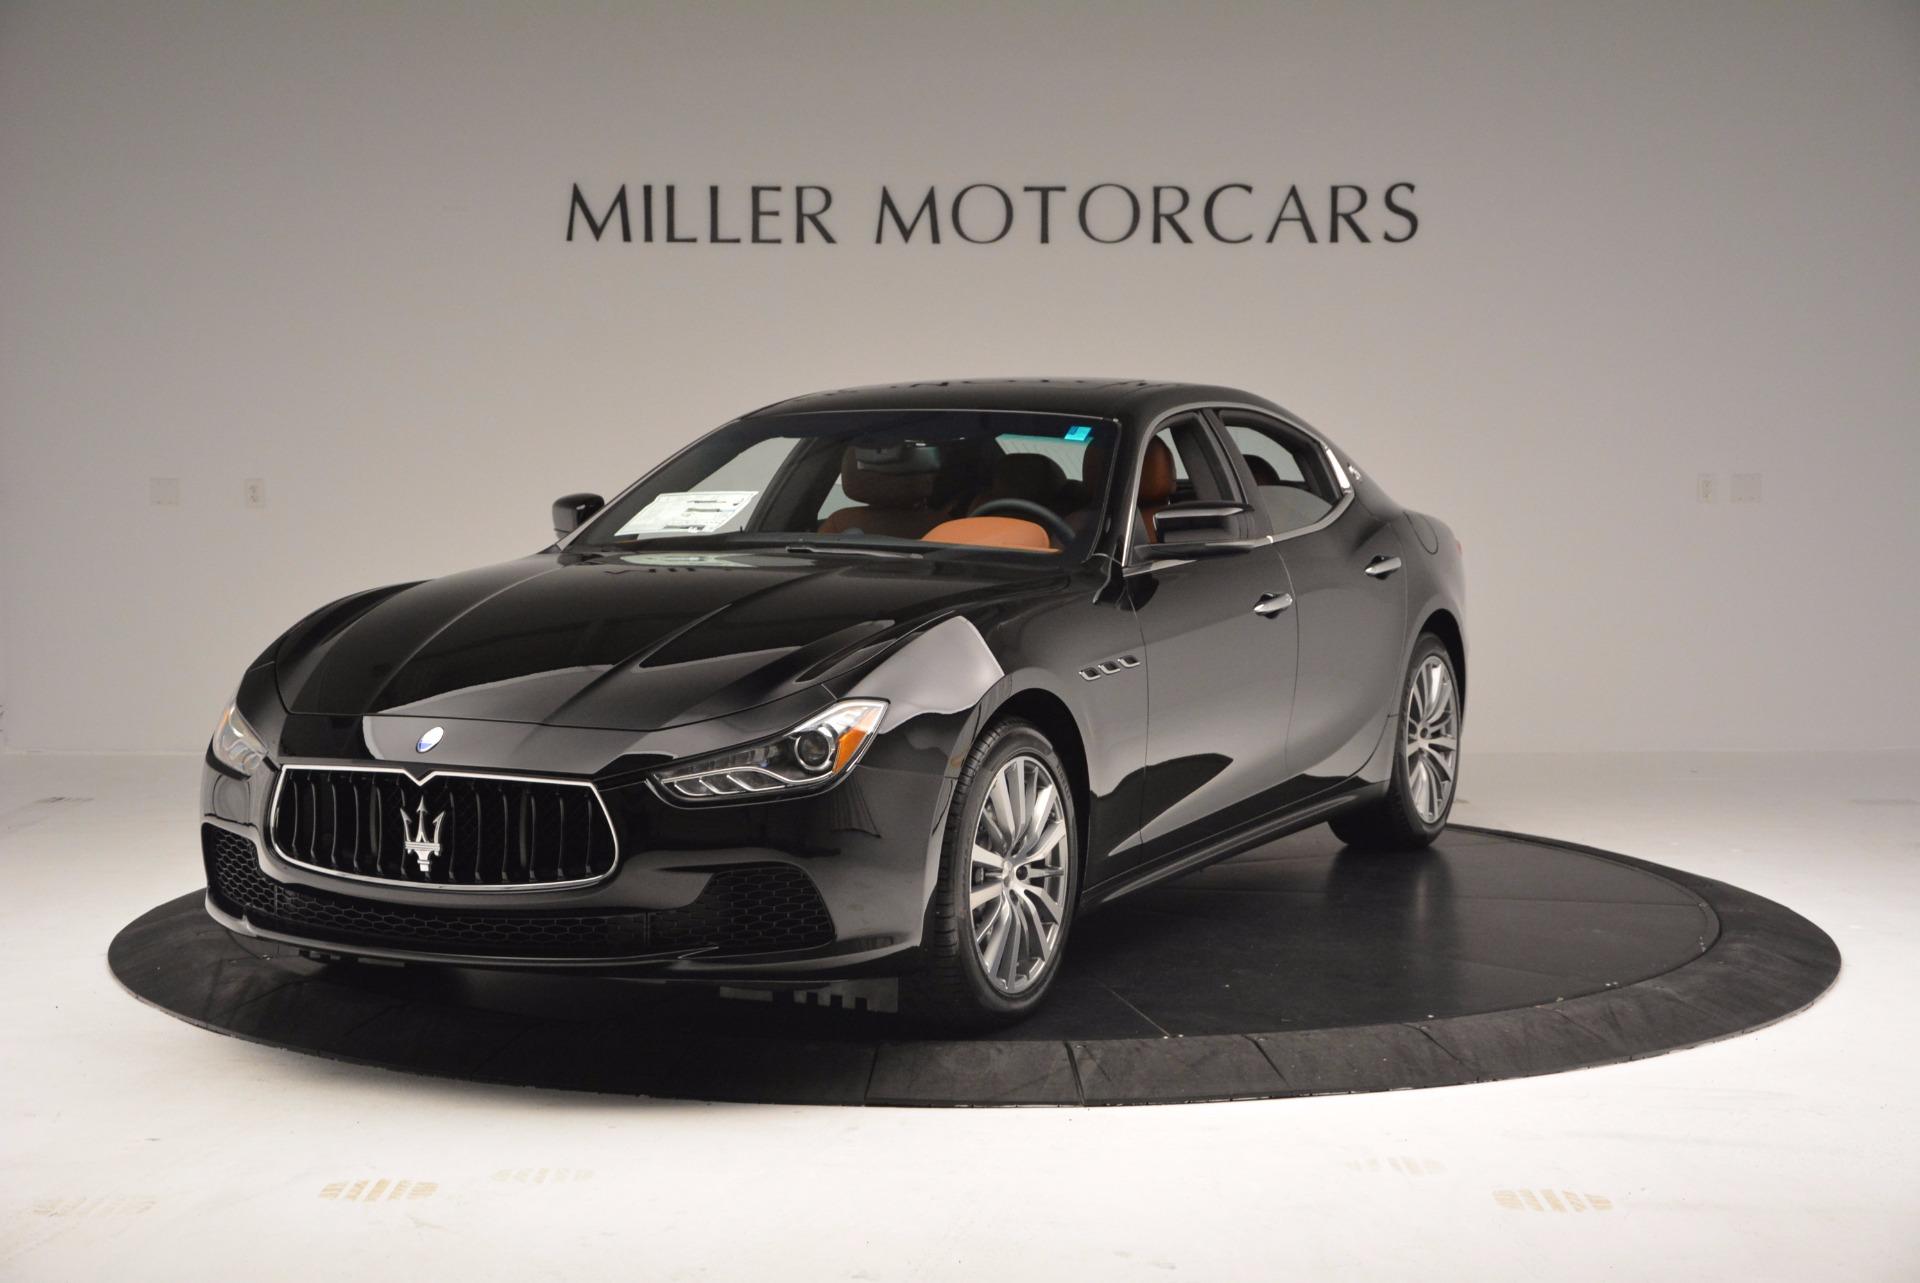 New 2017 Maserati Ghibli SQ4 For Sale In Greenwich, CT 1043_main